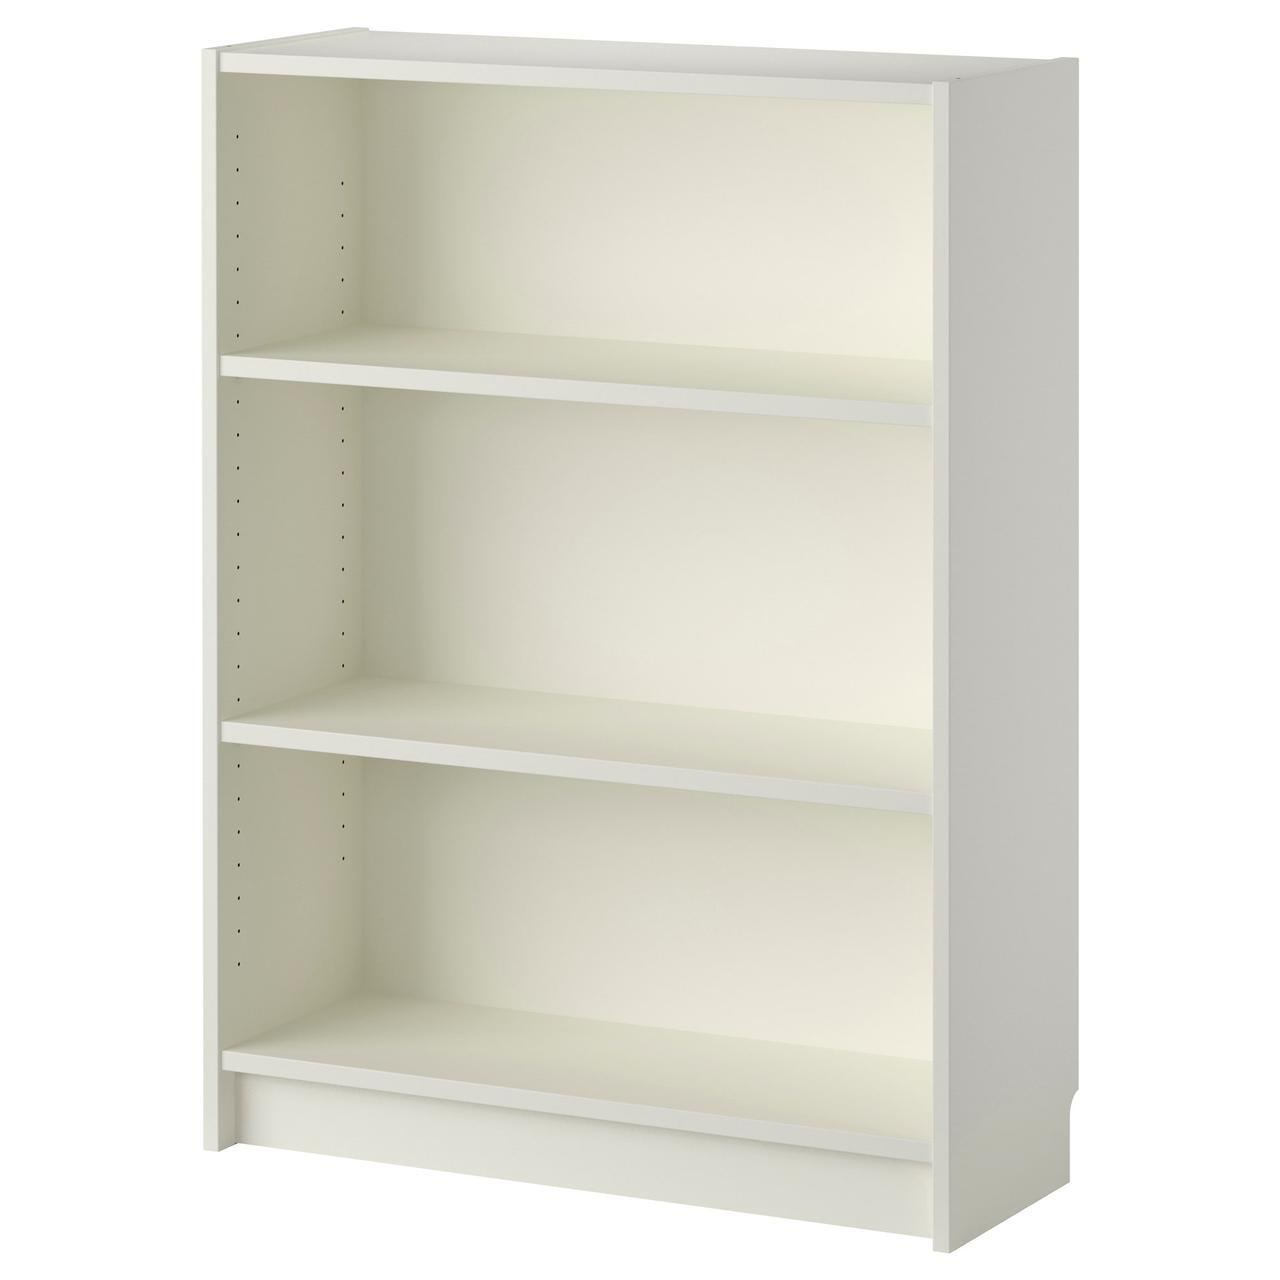 ✅ IKEA BILLY (302.638.44) Шкаф, белый